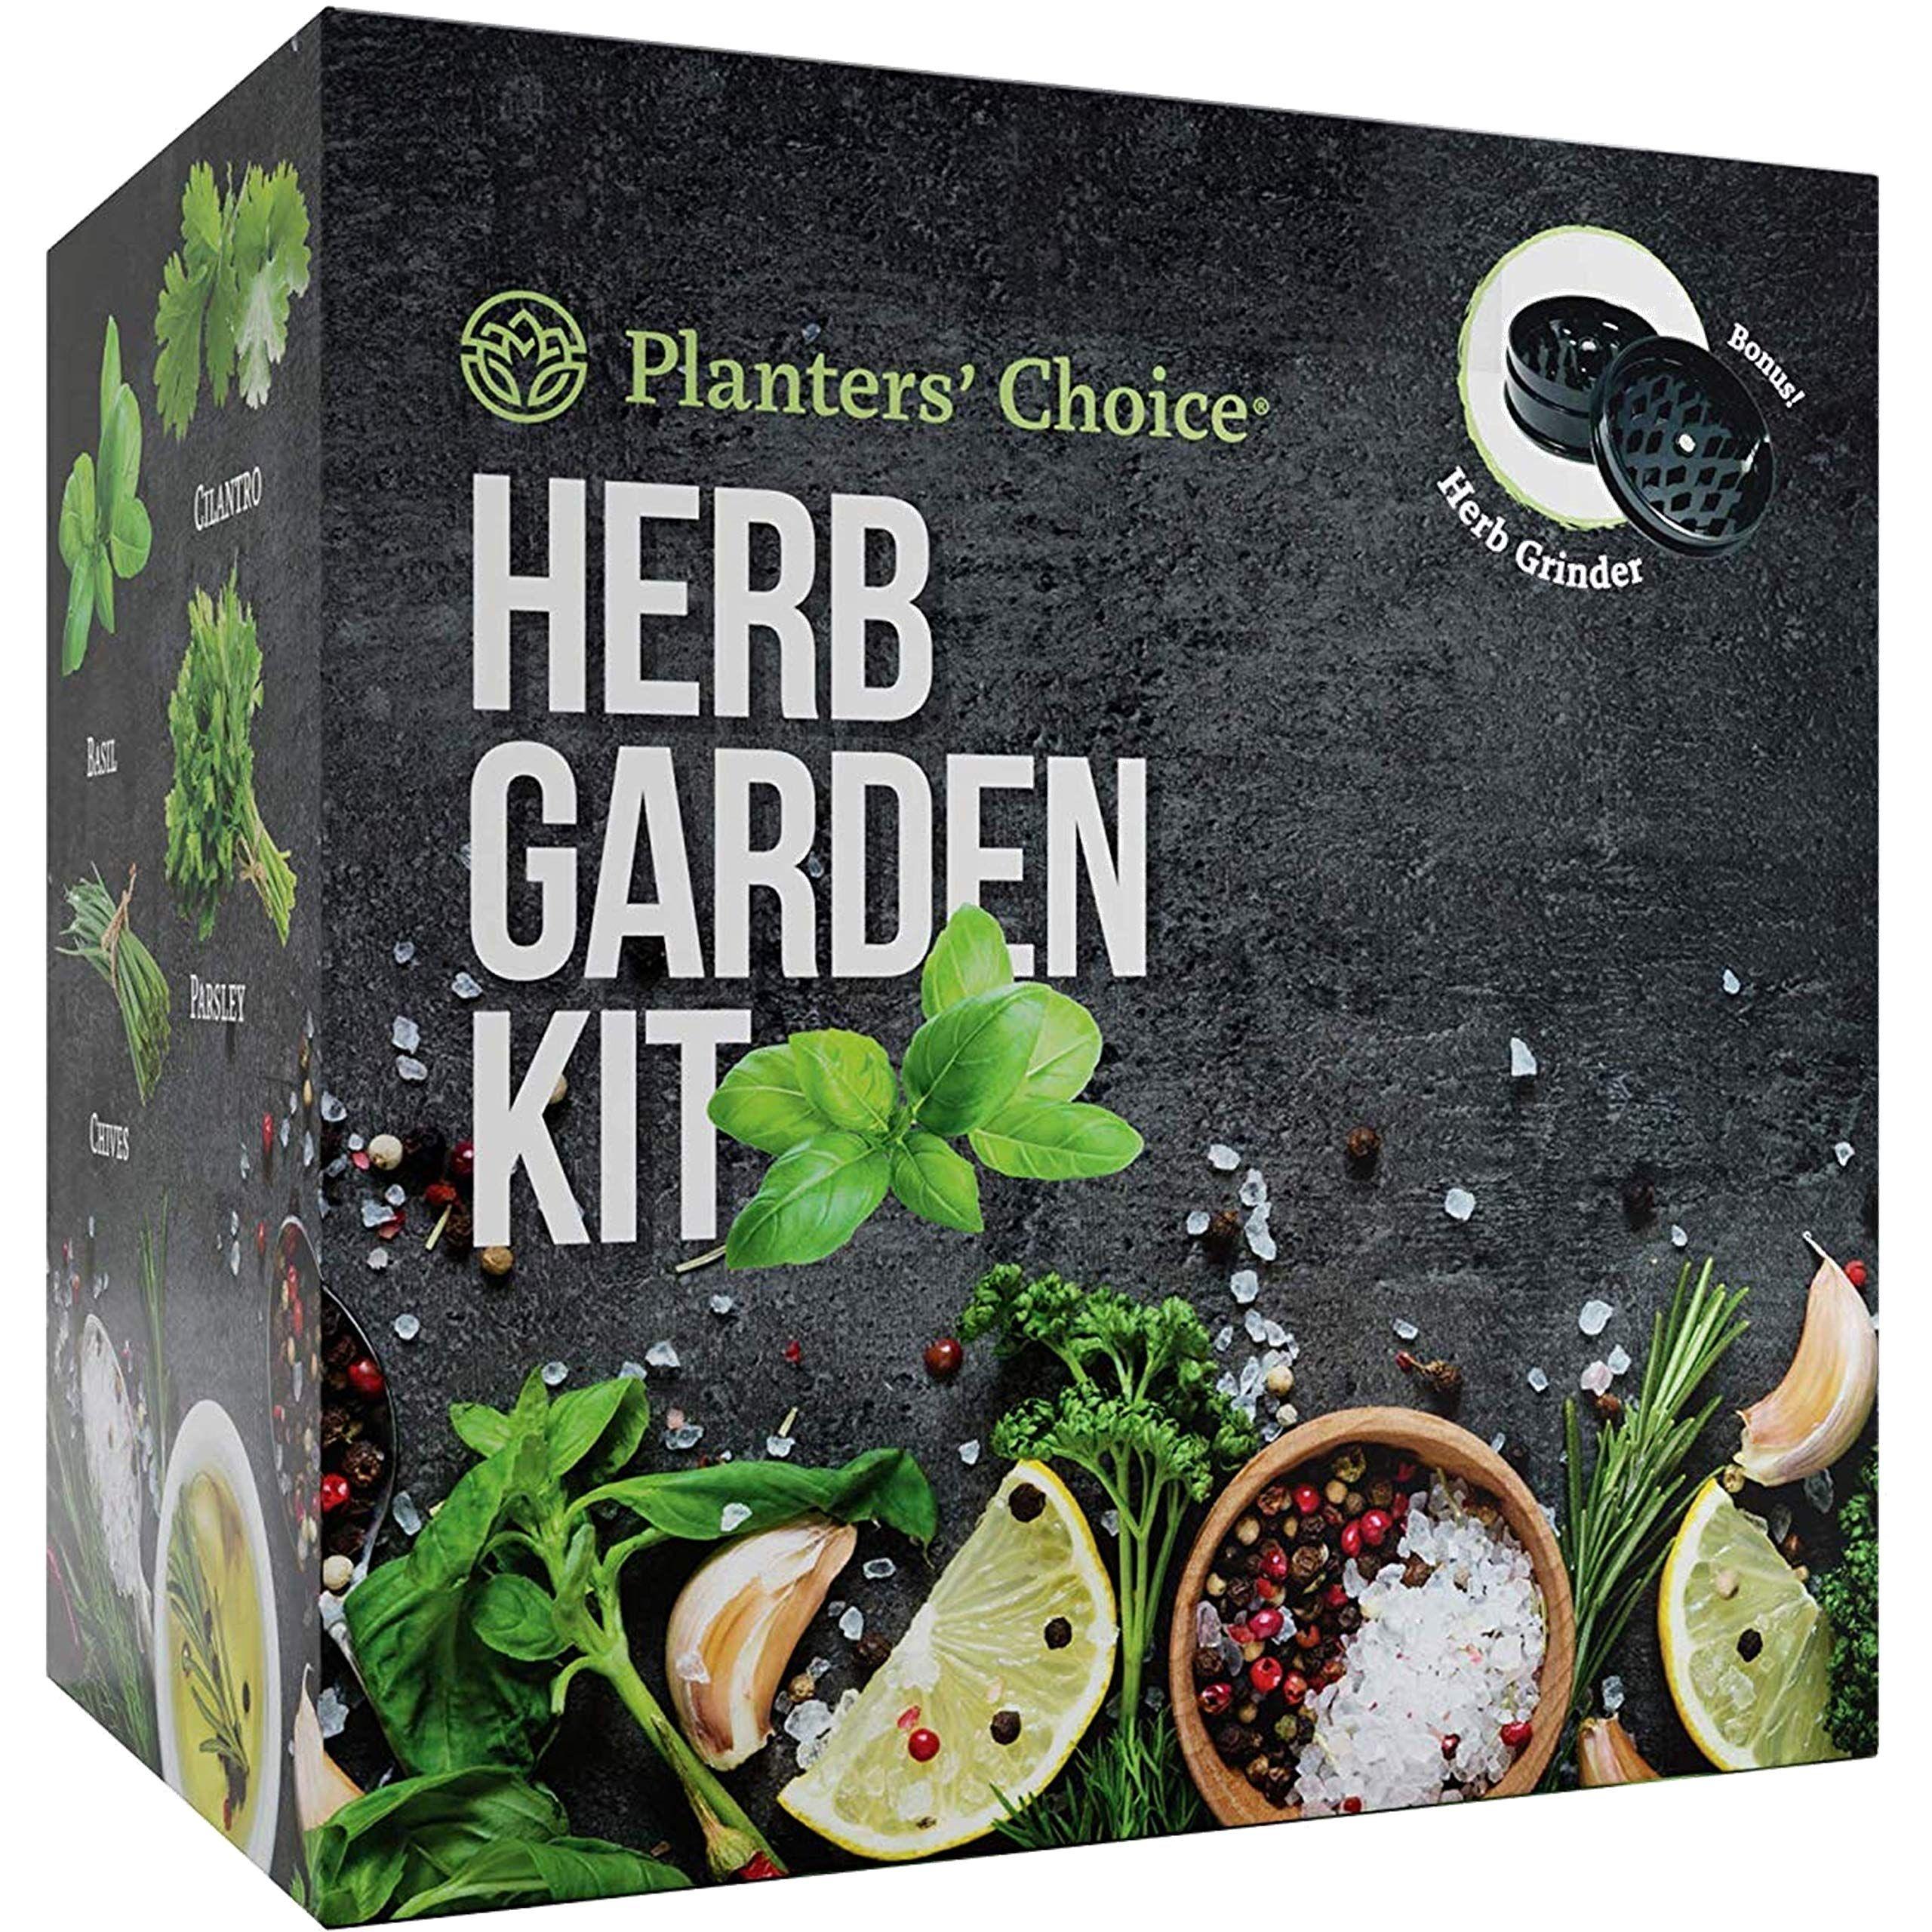 Planters' Choice Organic Herb Growing Kit Herb Grinder